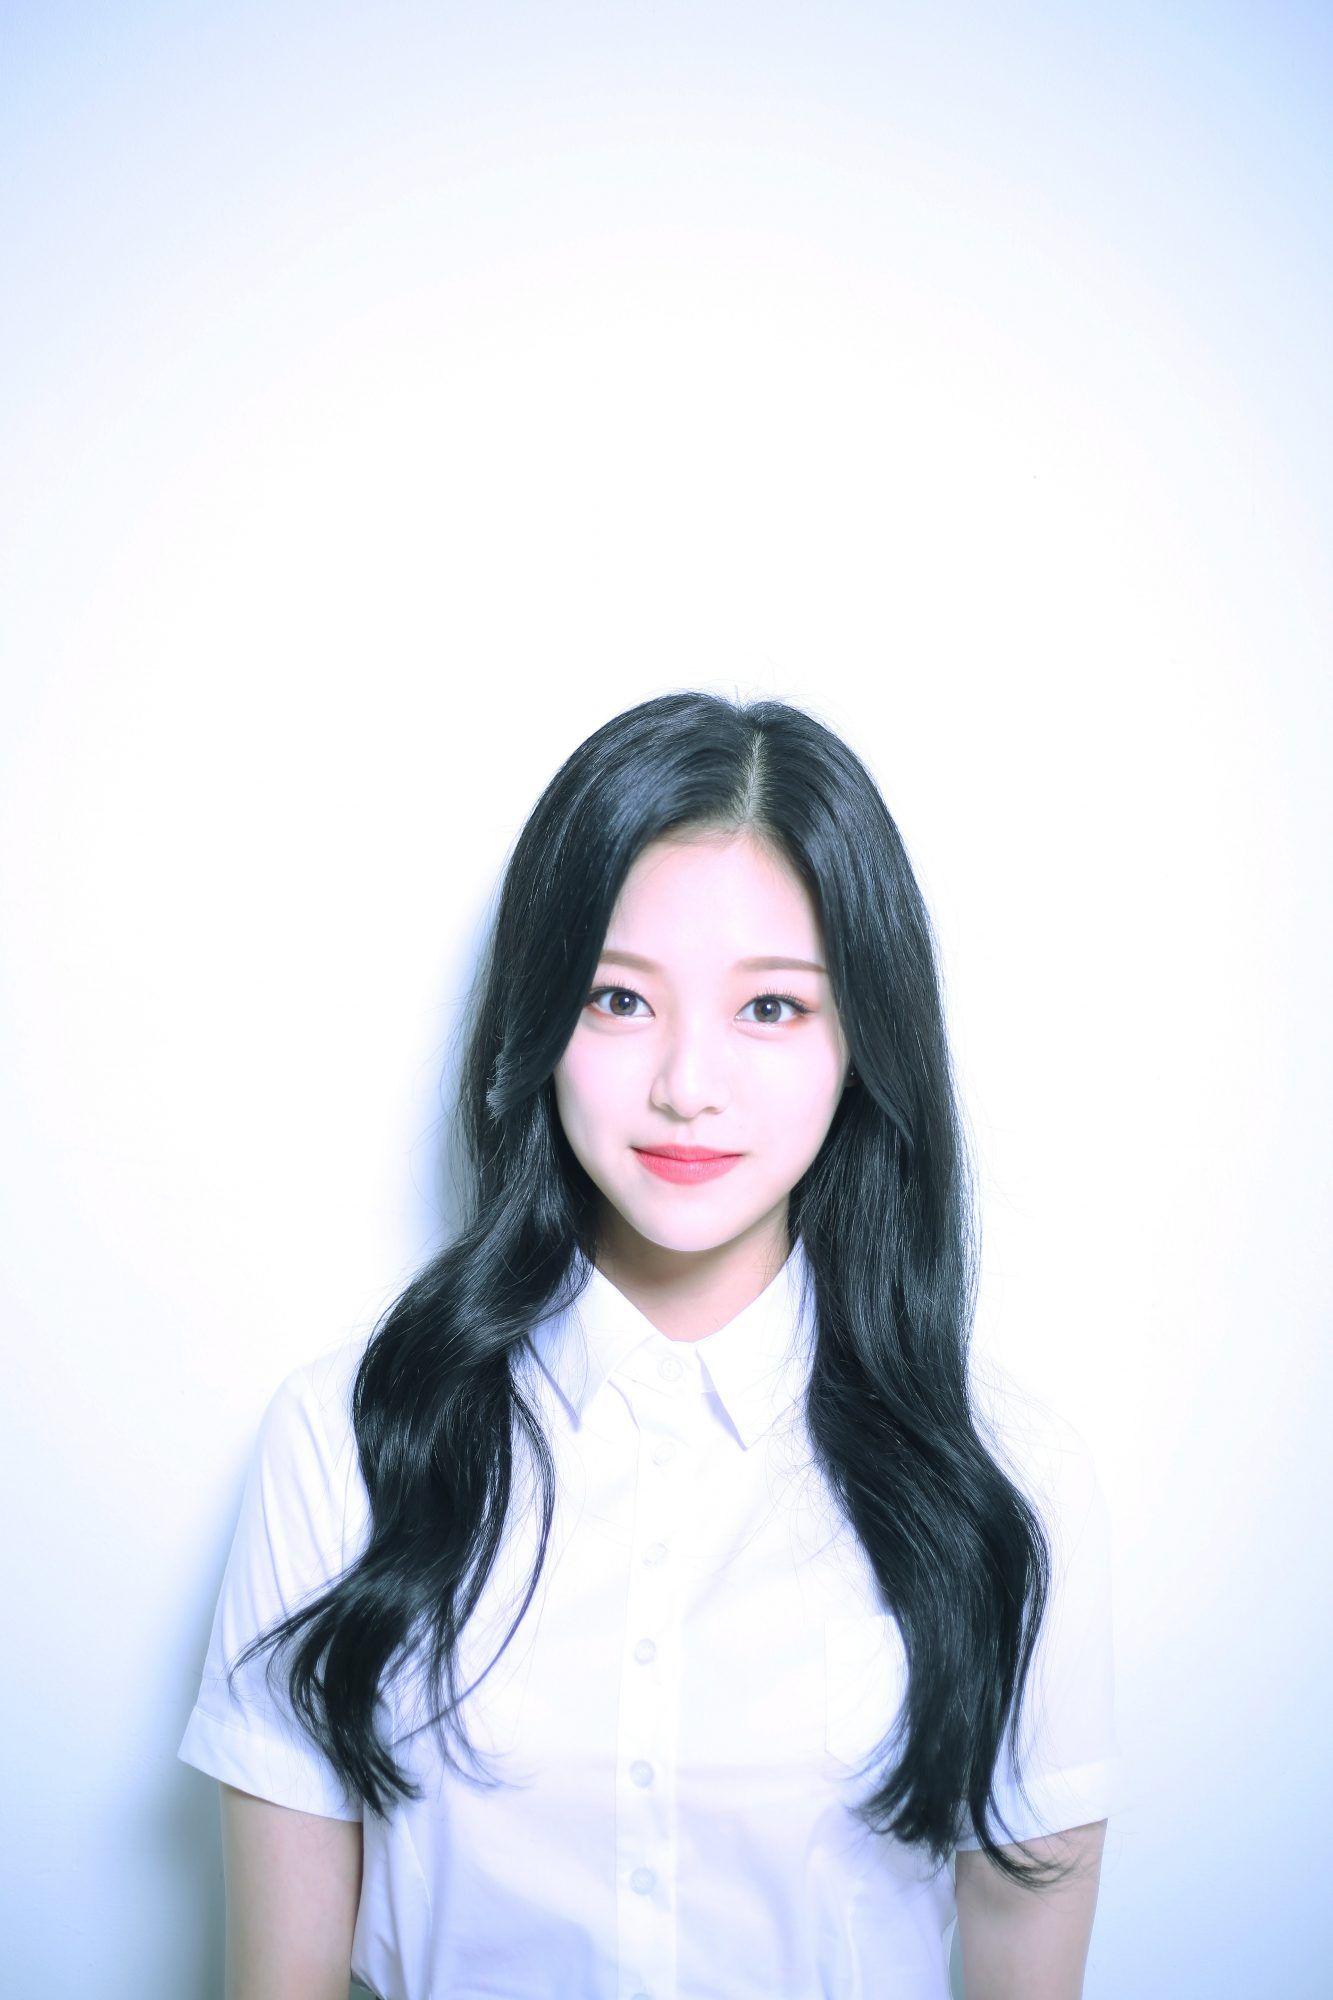 LOONA Debut ++ HR/HD Profile Photos | loona | Korean girl groups